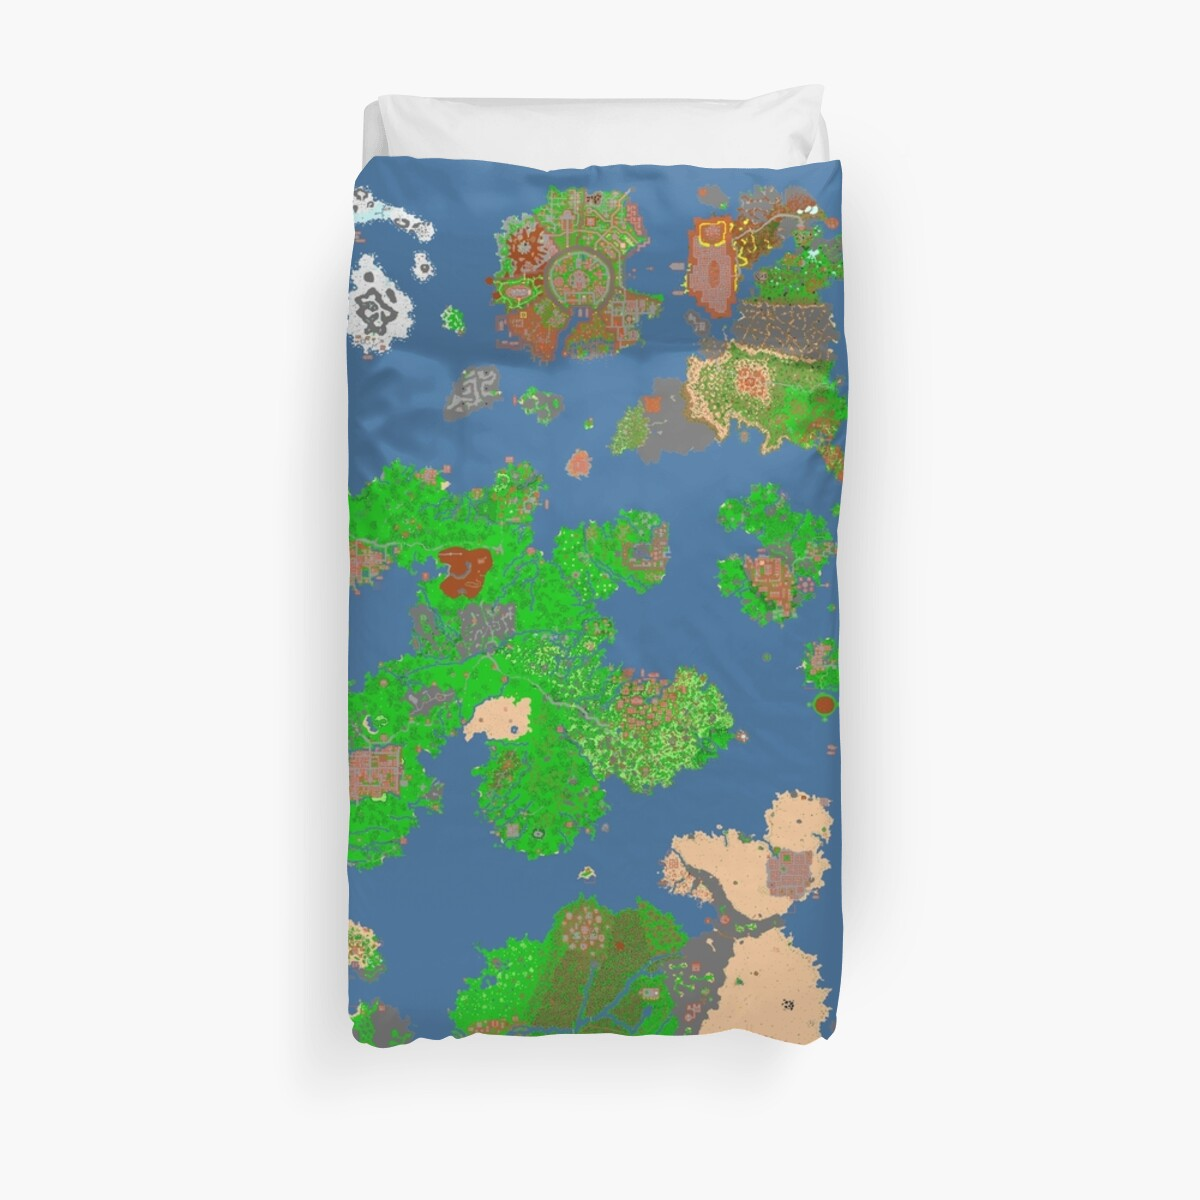 Tibia World Map.Tibia World Map Duvet Covers By Arthur Romeu Redbubble